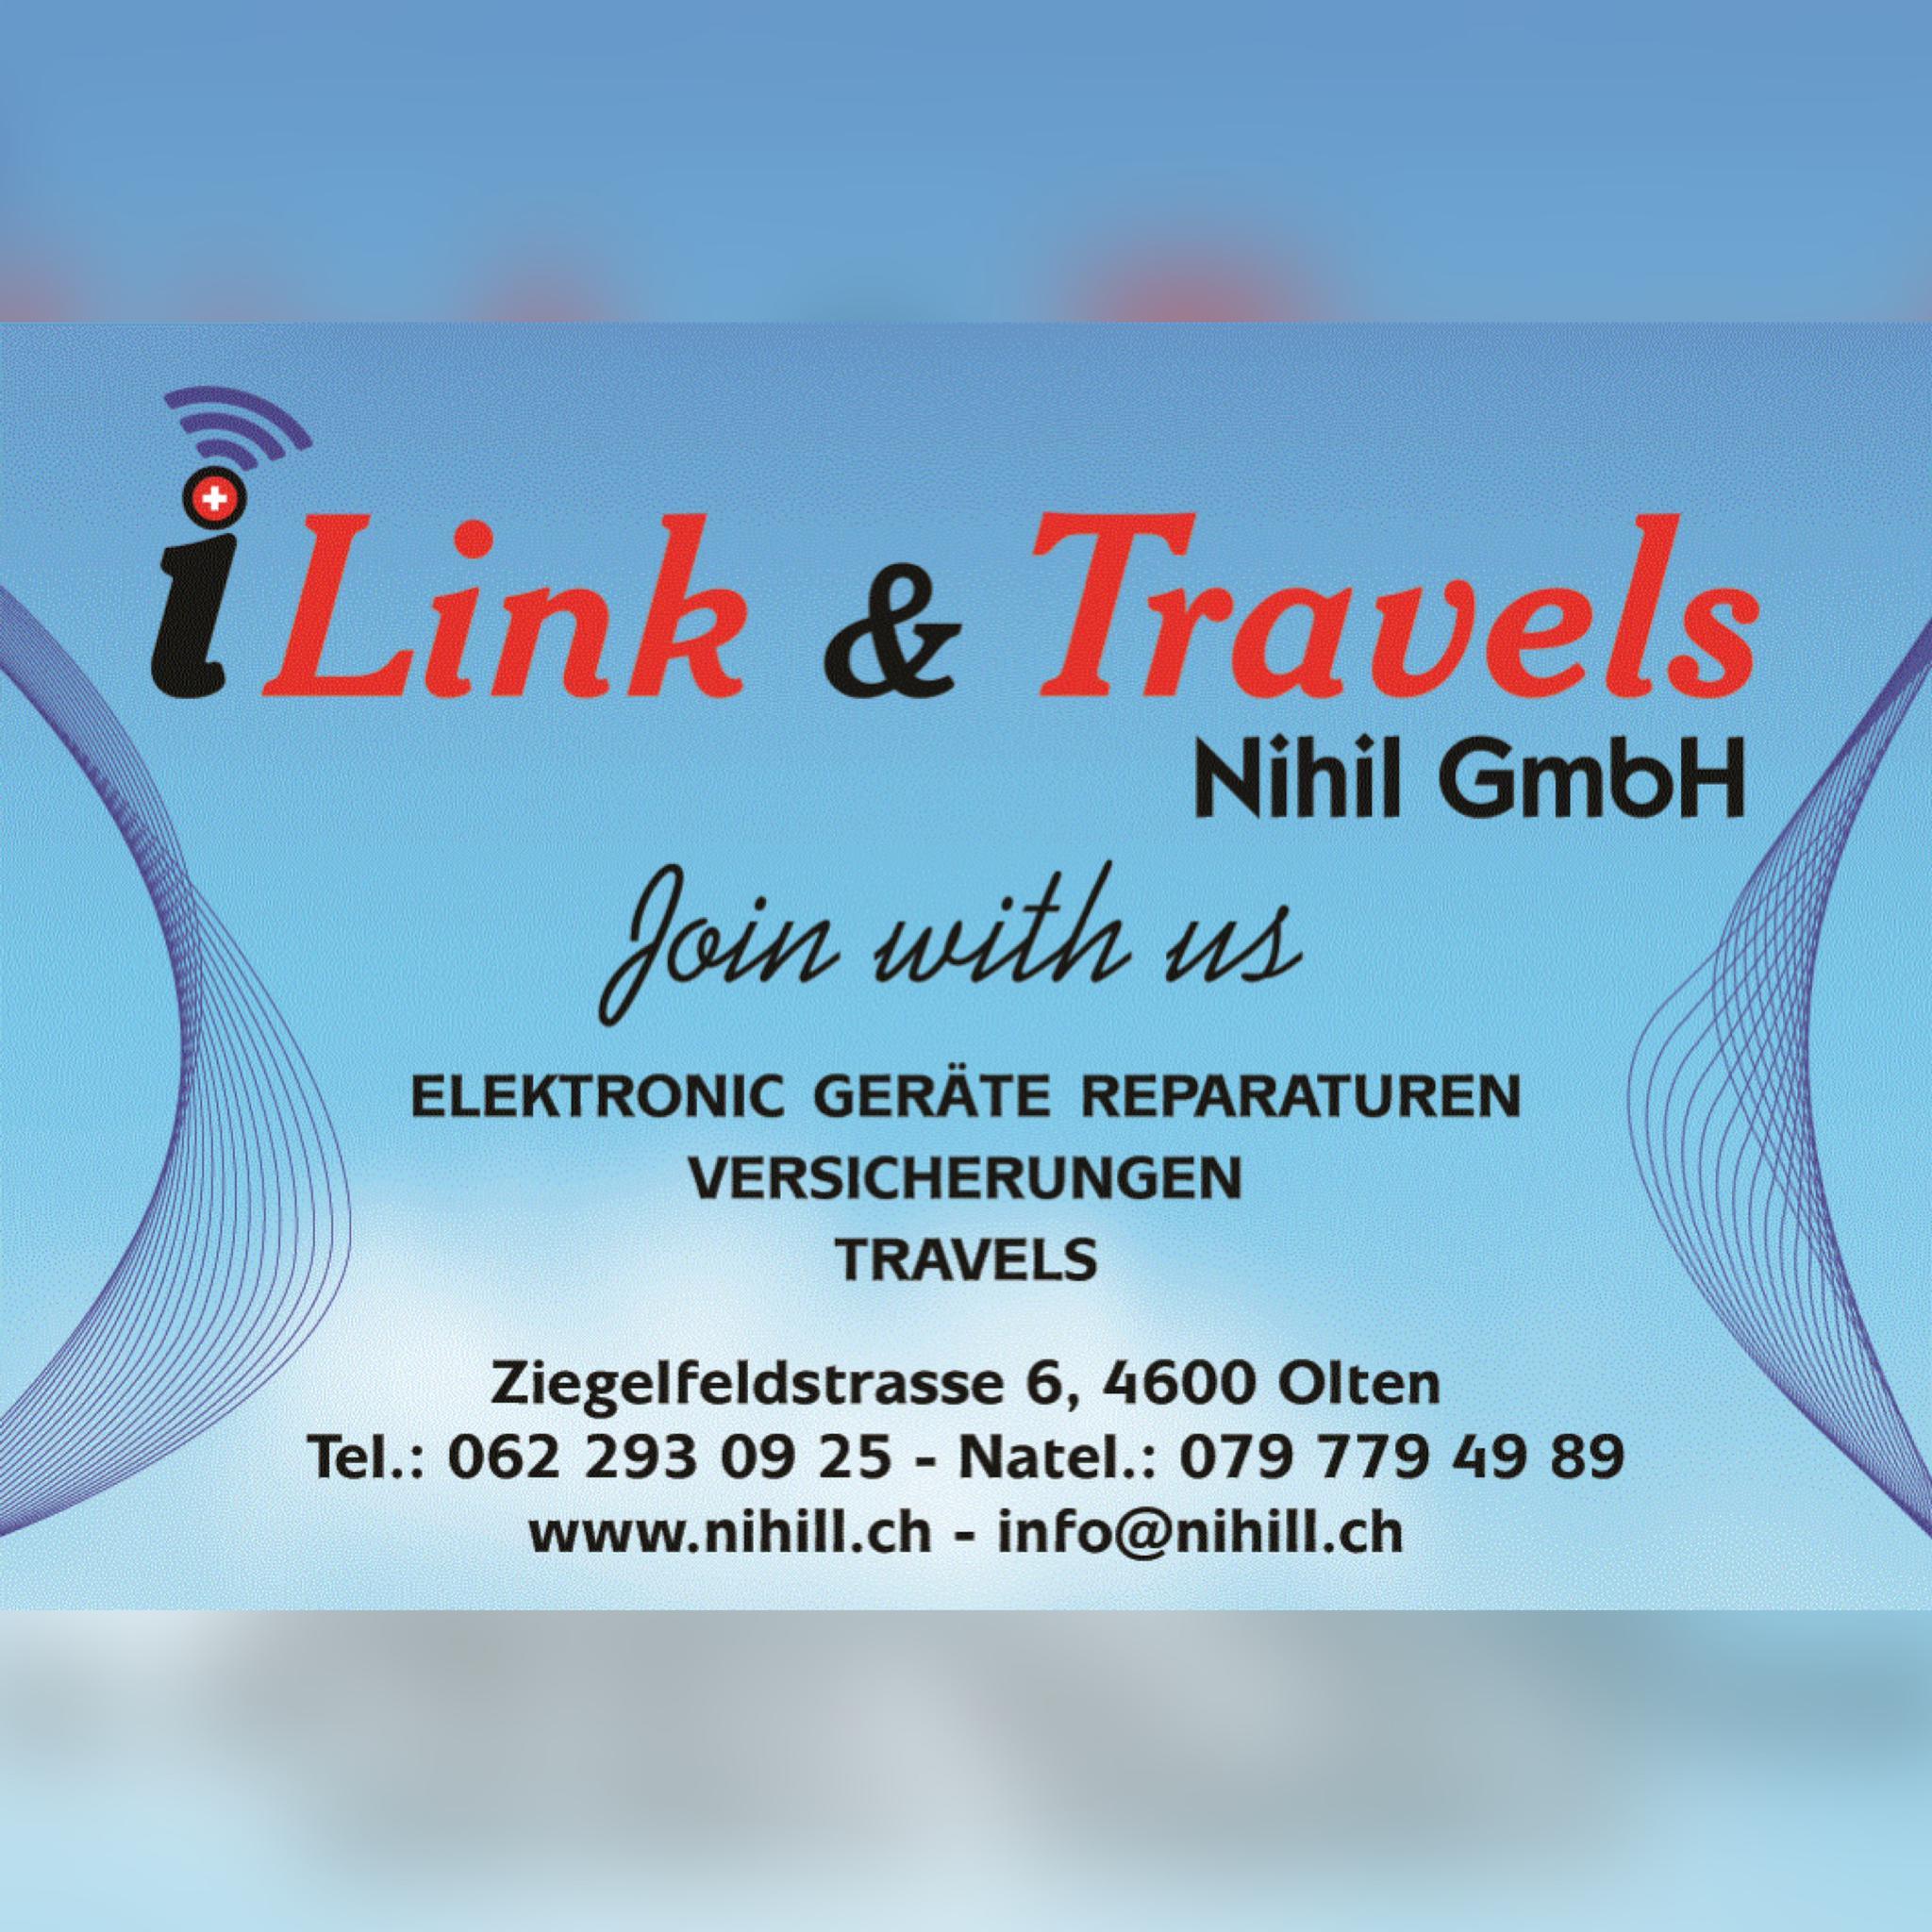 iLink & Travels